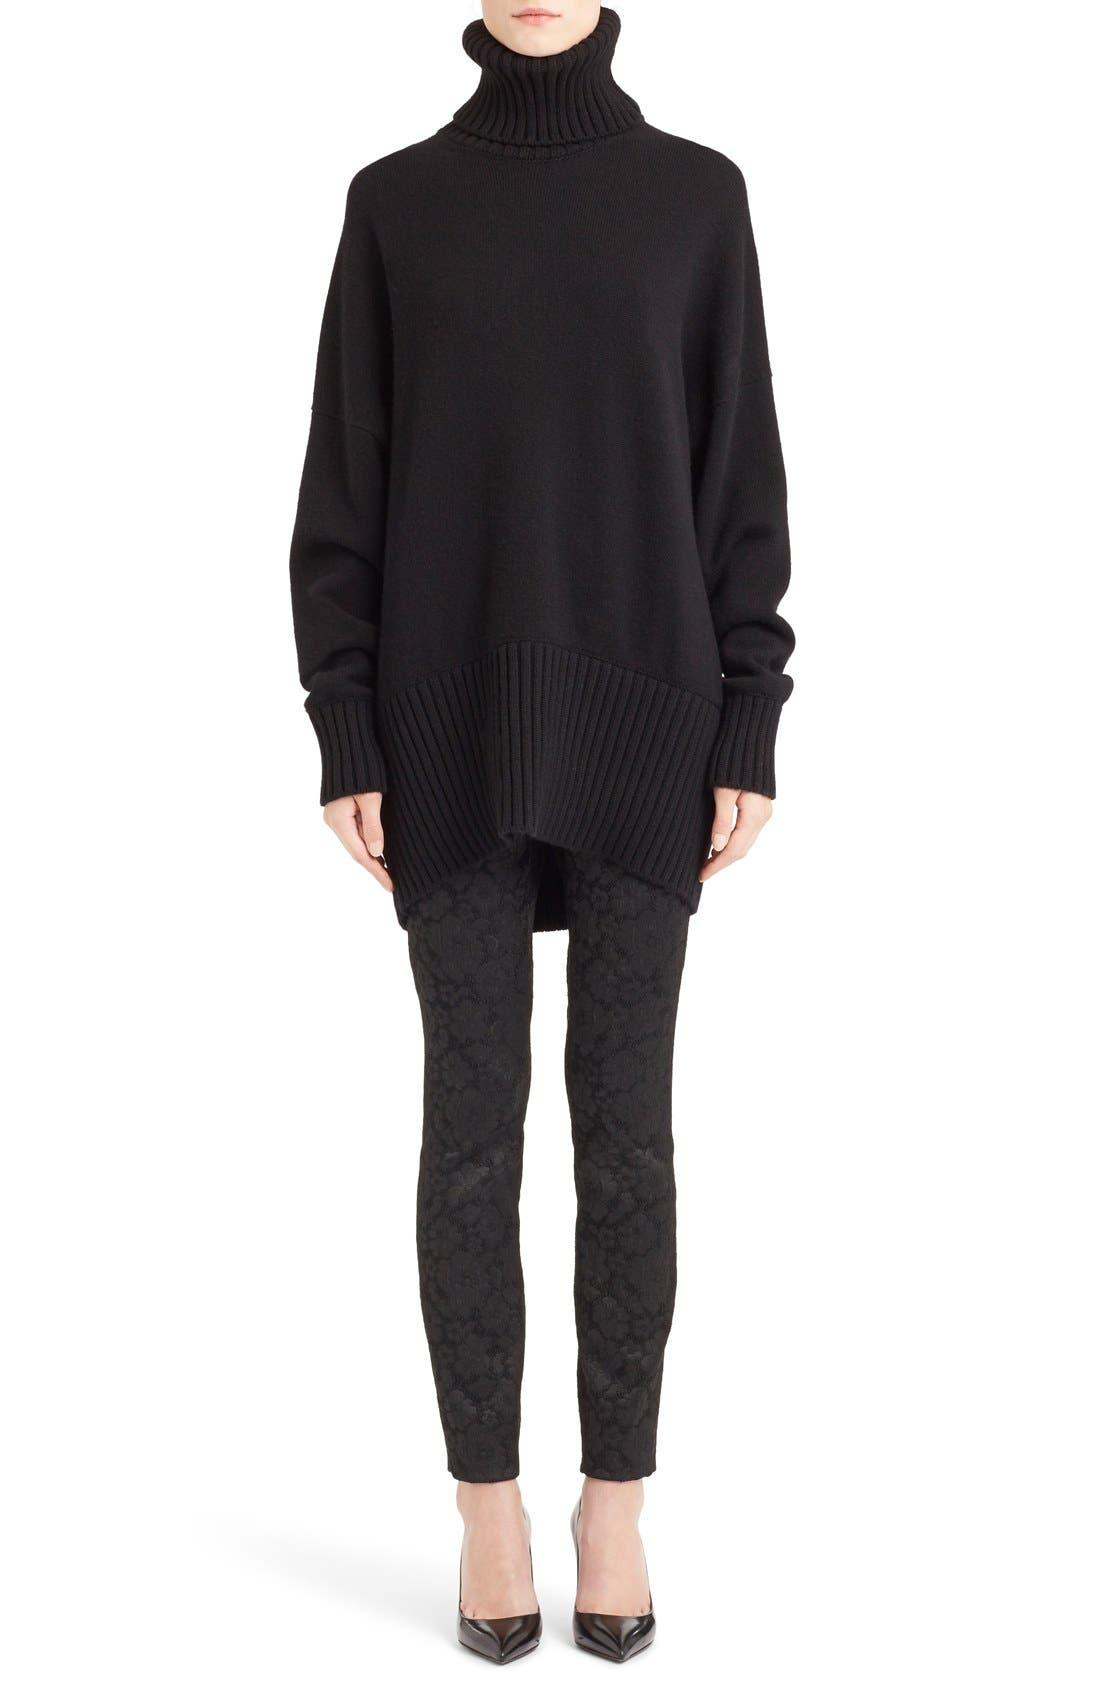 Alternate Image 1 Selected - Dolce&Gabbana Turtleneck Cashmere Sweater